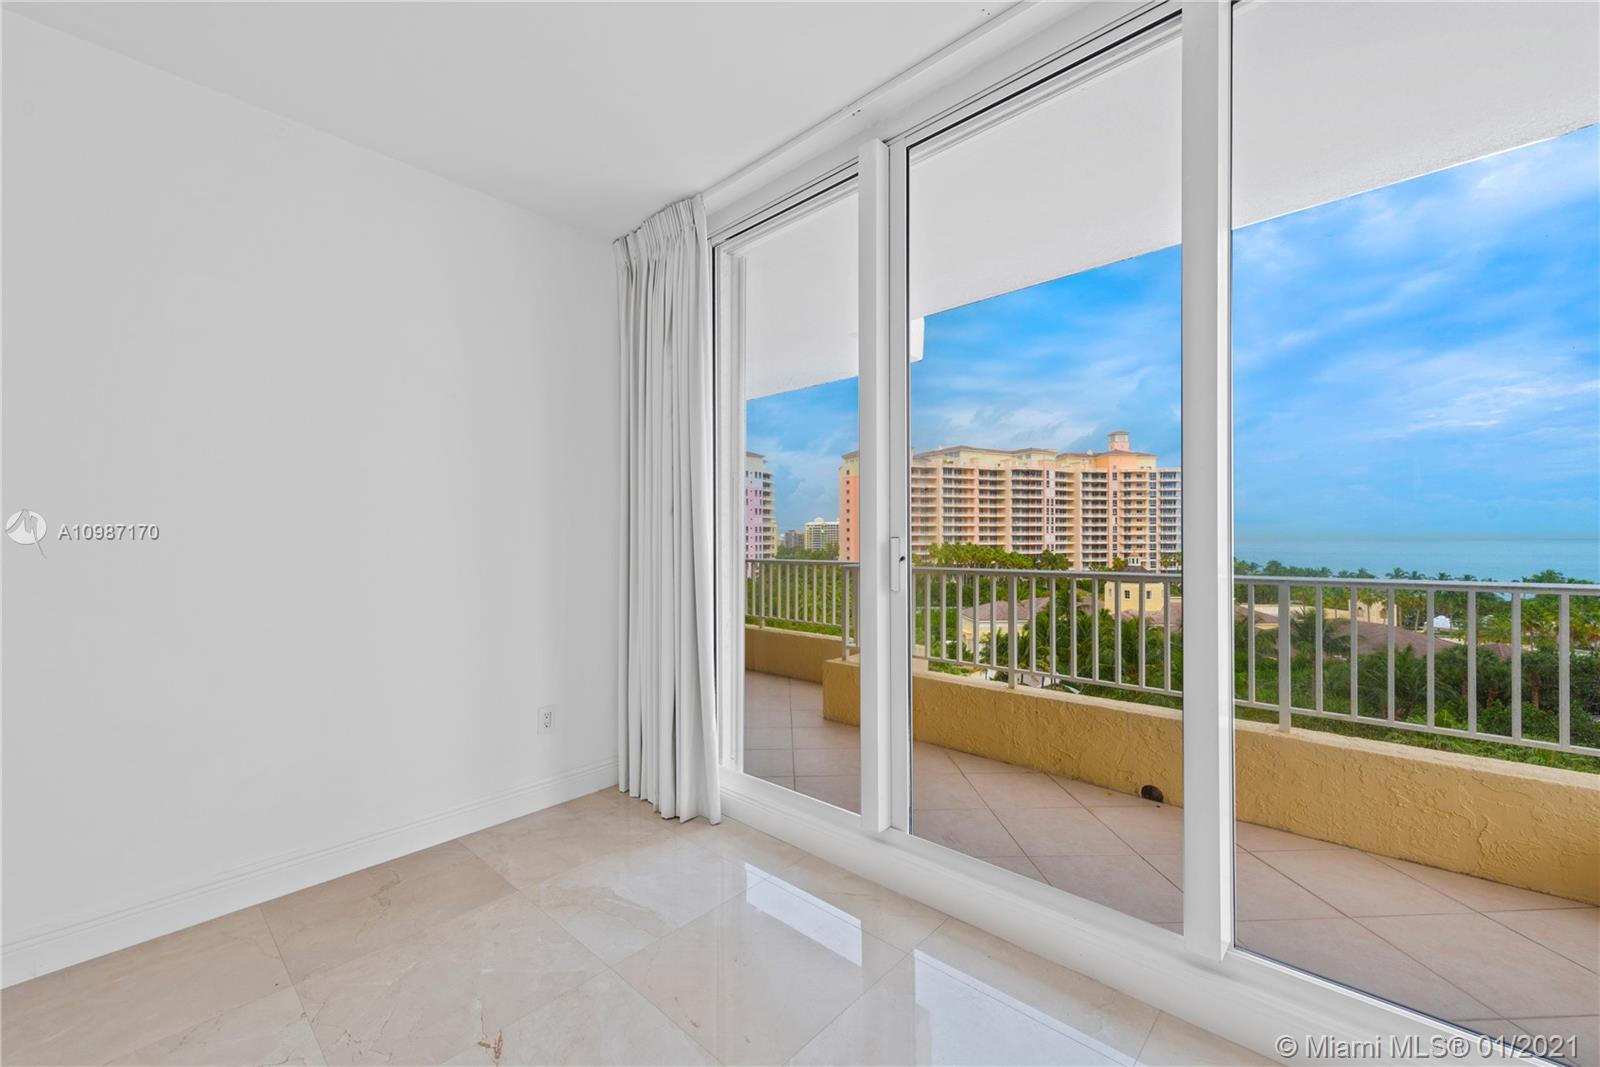 789 Crandon Blvd # 801, Key Biscayne, Florida 33149, 3 Bedrooms Bedrooms, ,4 BathroomsBathrooms,Residential,For Sale,789 Crandon Blvd # 801,A10987170